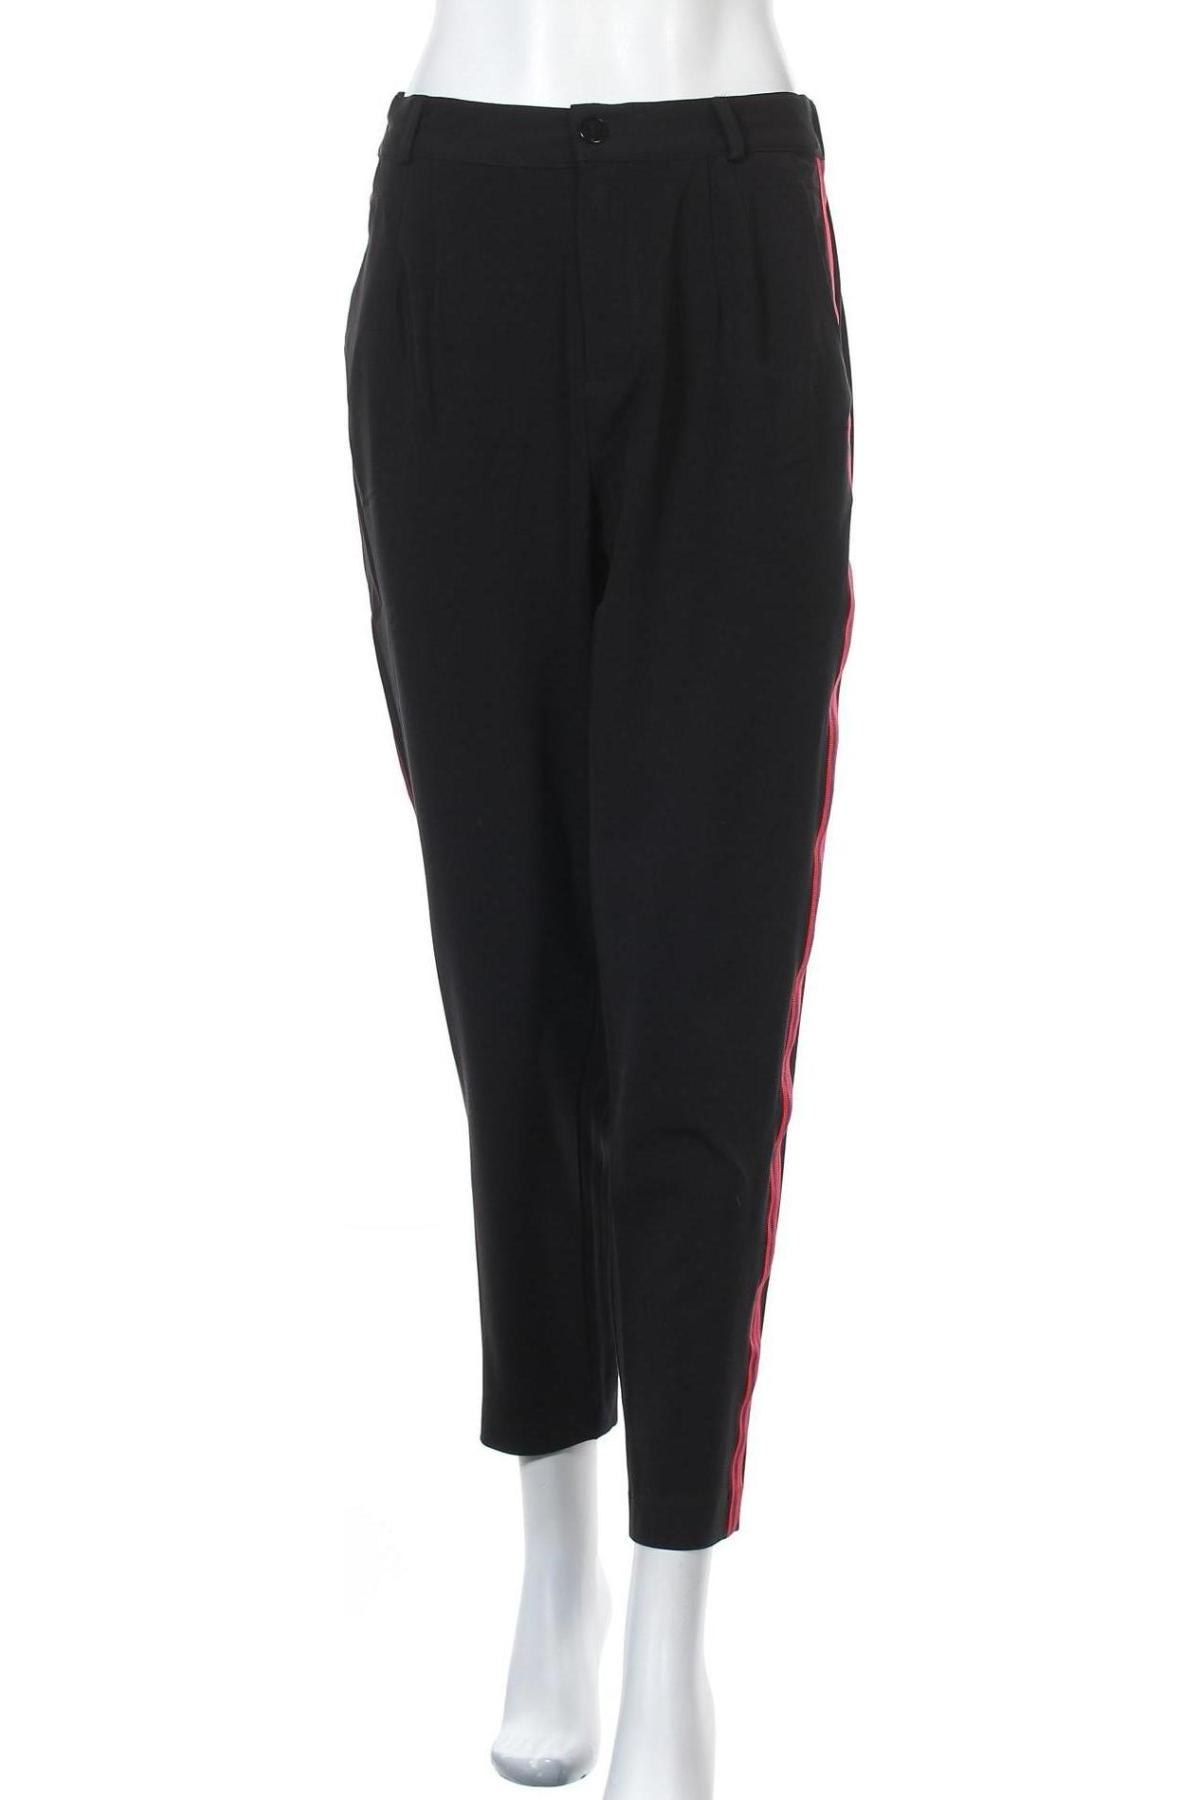 Дамски панталон Twintip, Размер M, Цвят Черен, 63% полиестер, 33% вискоза, 4% еластан, Цена 20,19лв.